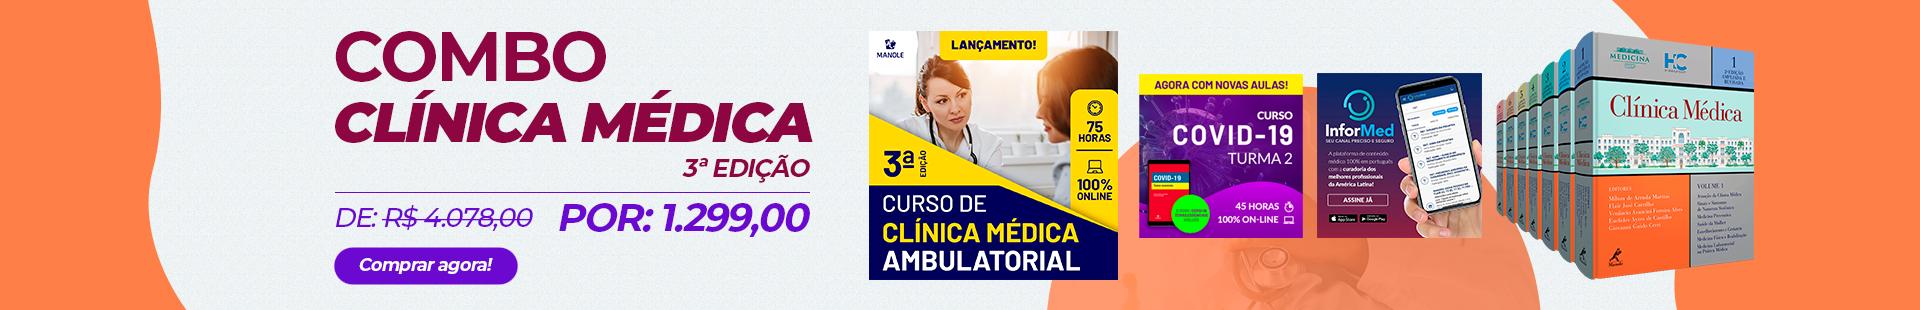 Combo de Clínica Médica